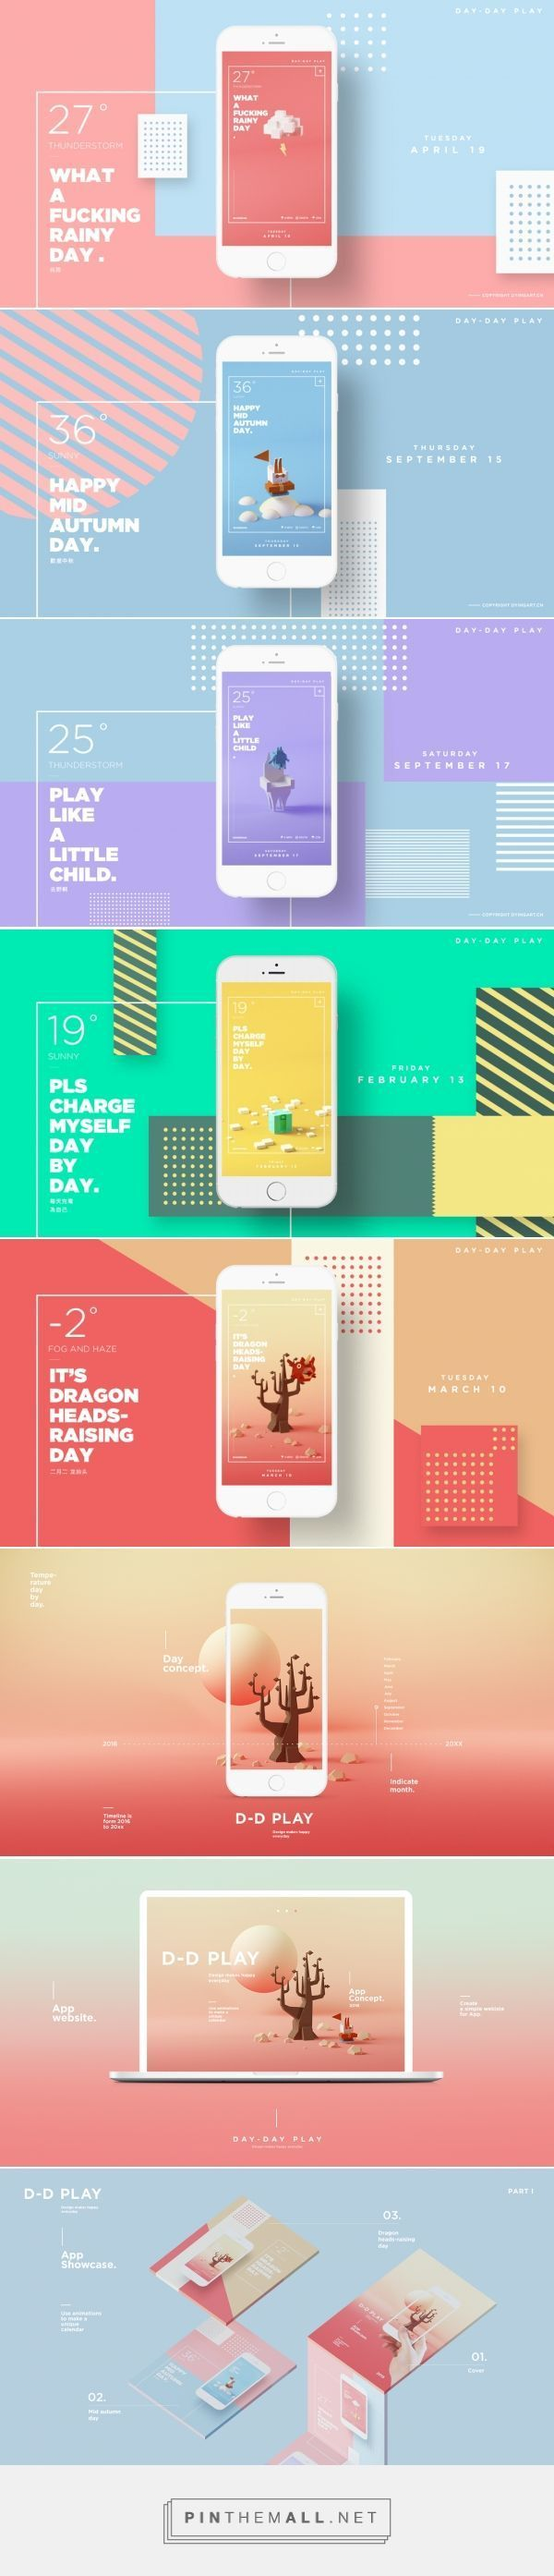 D-D Play - App Design | Abduzeedo Design Inspiration  Latest News & Trends on #webdesign | http://webworksagency.com